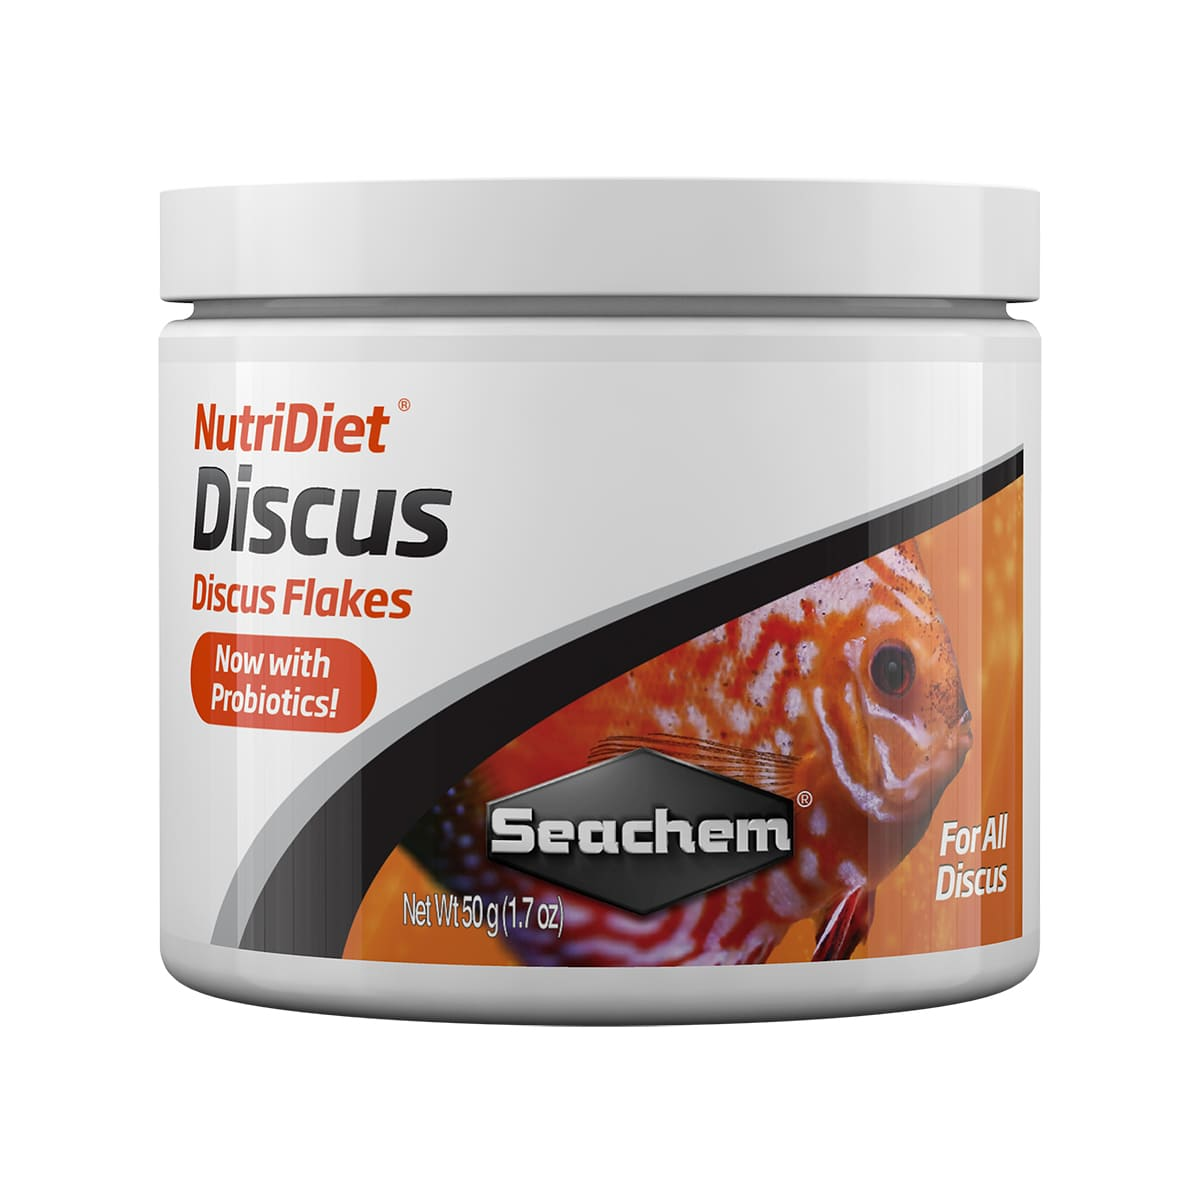 Ração Seachem Nutridiet Discus Flakes Probiotics Formula 50g